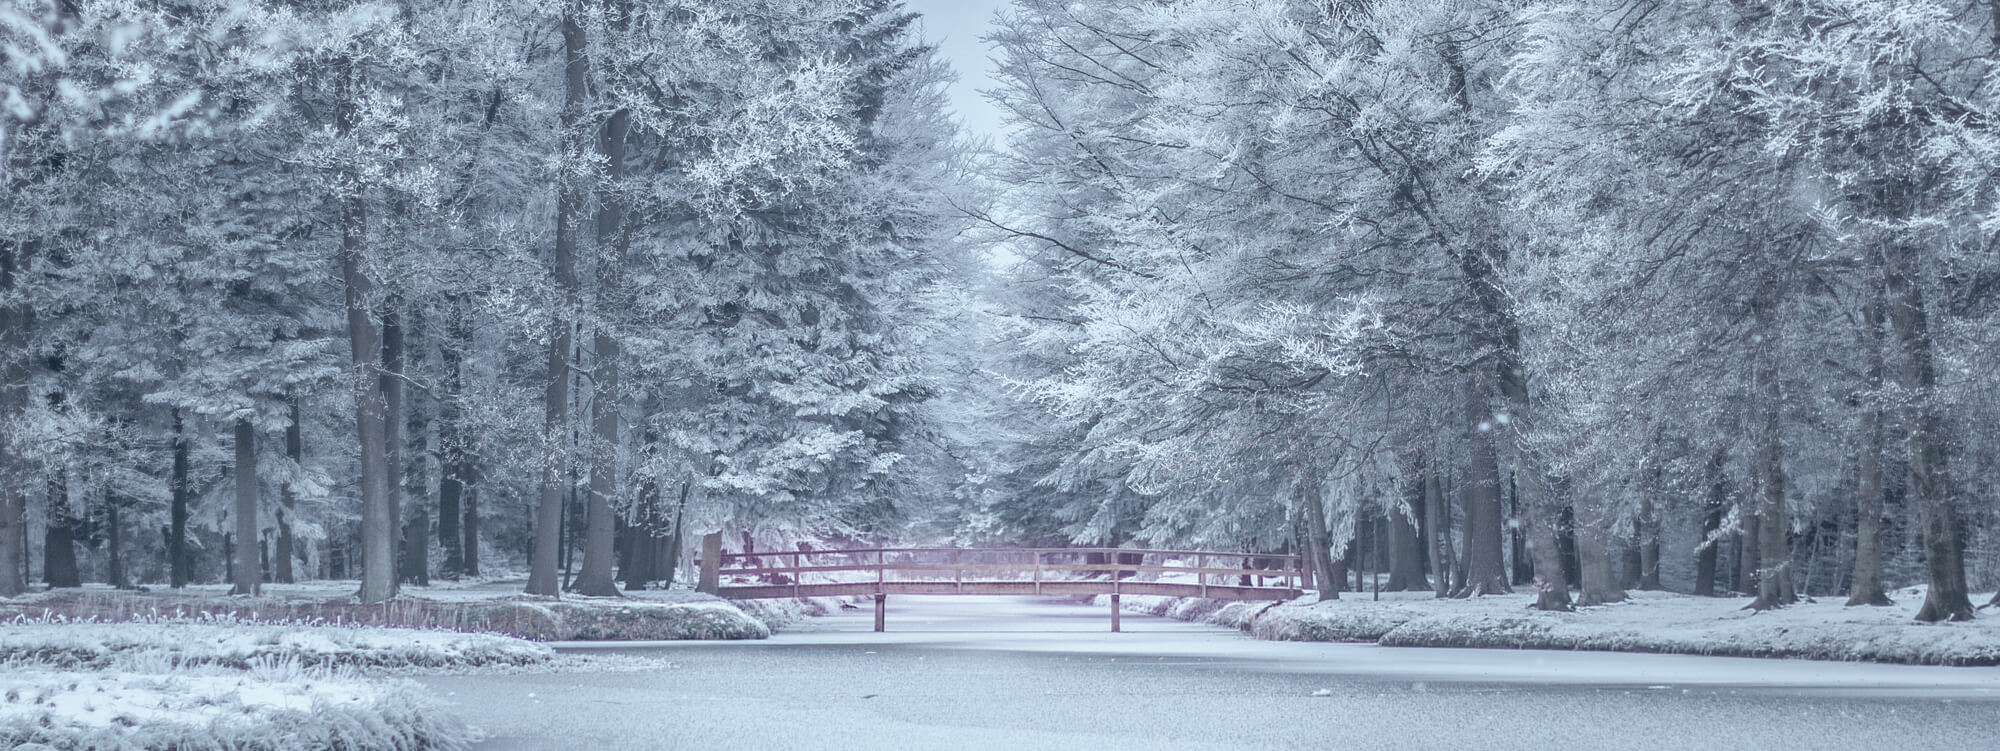 snow bg 2